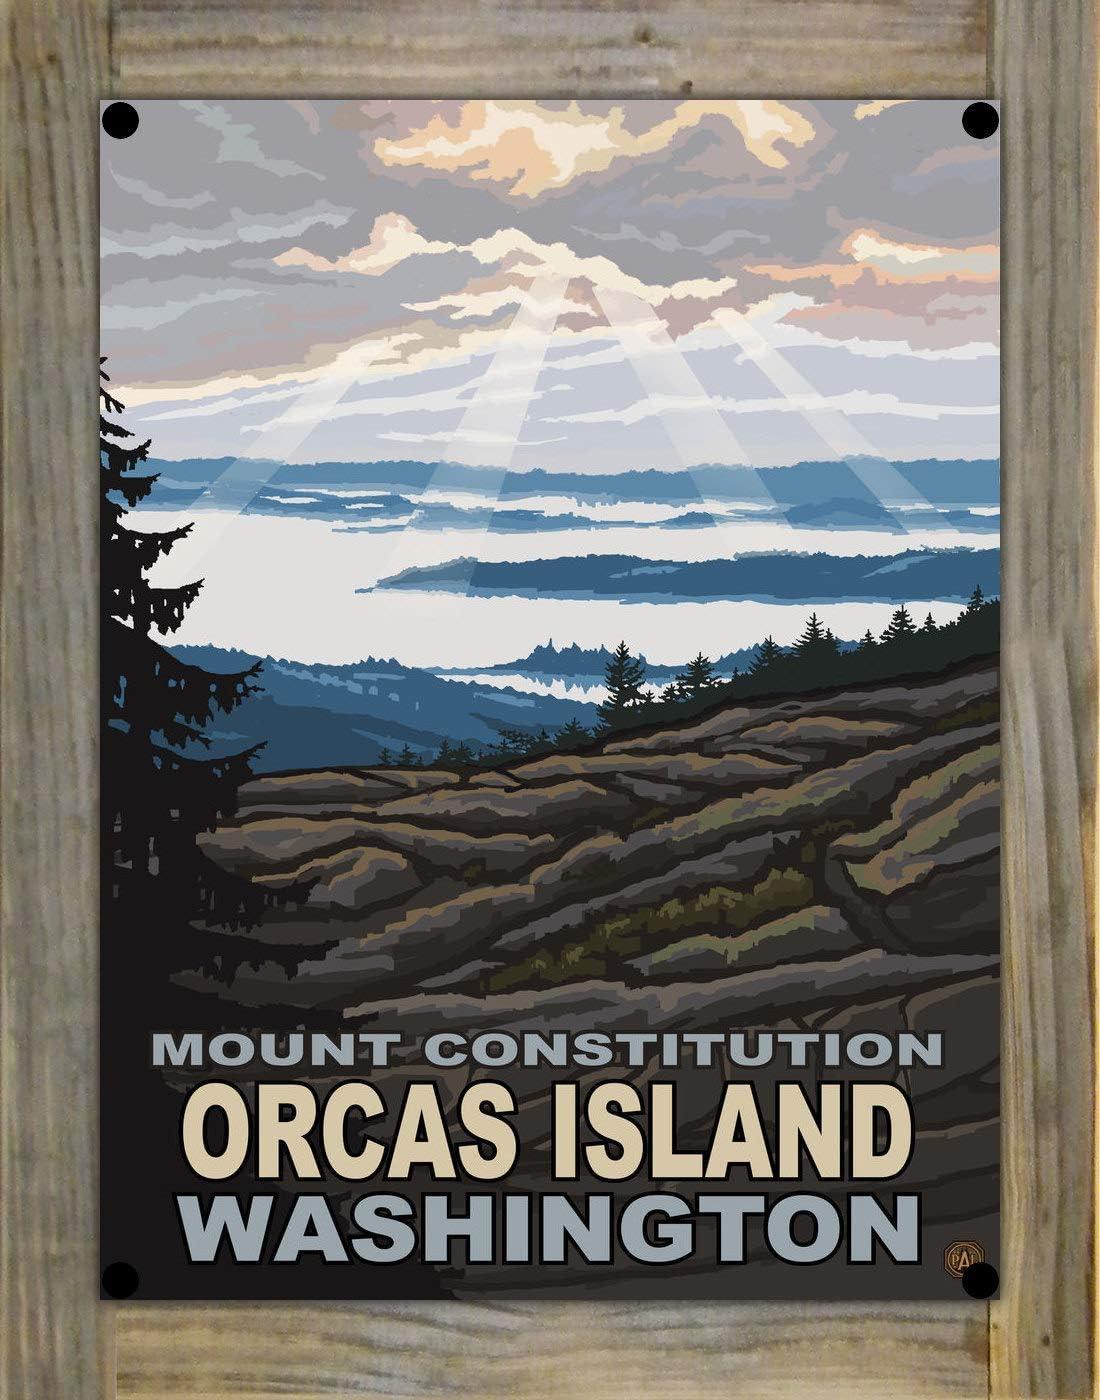 Northwest Art Mall Mount Constitution Orcas Island Washington Metal Print on Reclaimed Barn Wood from Original Travel Artwork by Artist Paul A. Lanquist 9